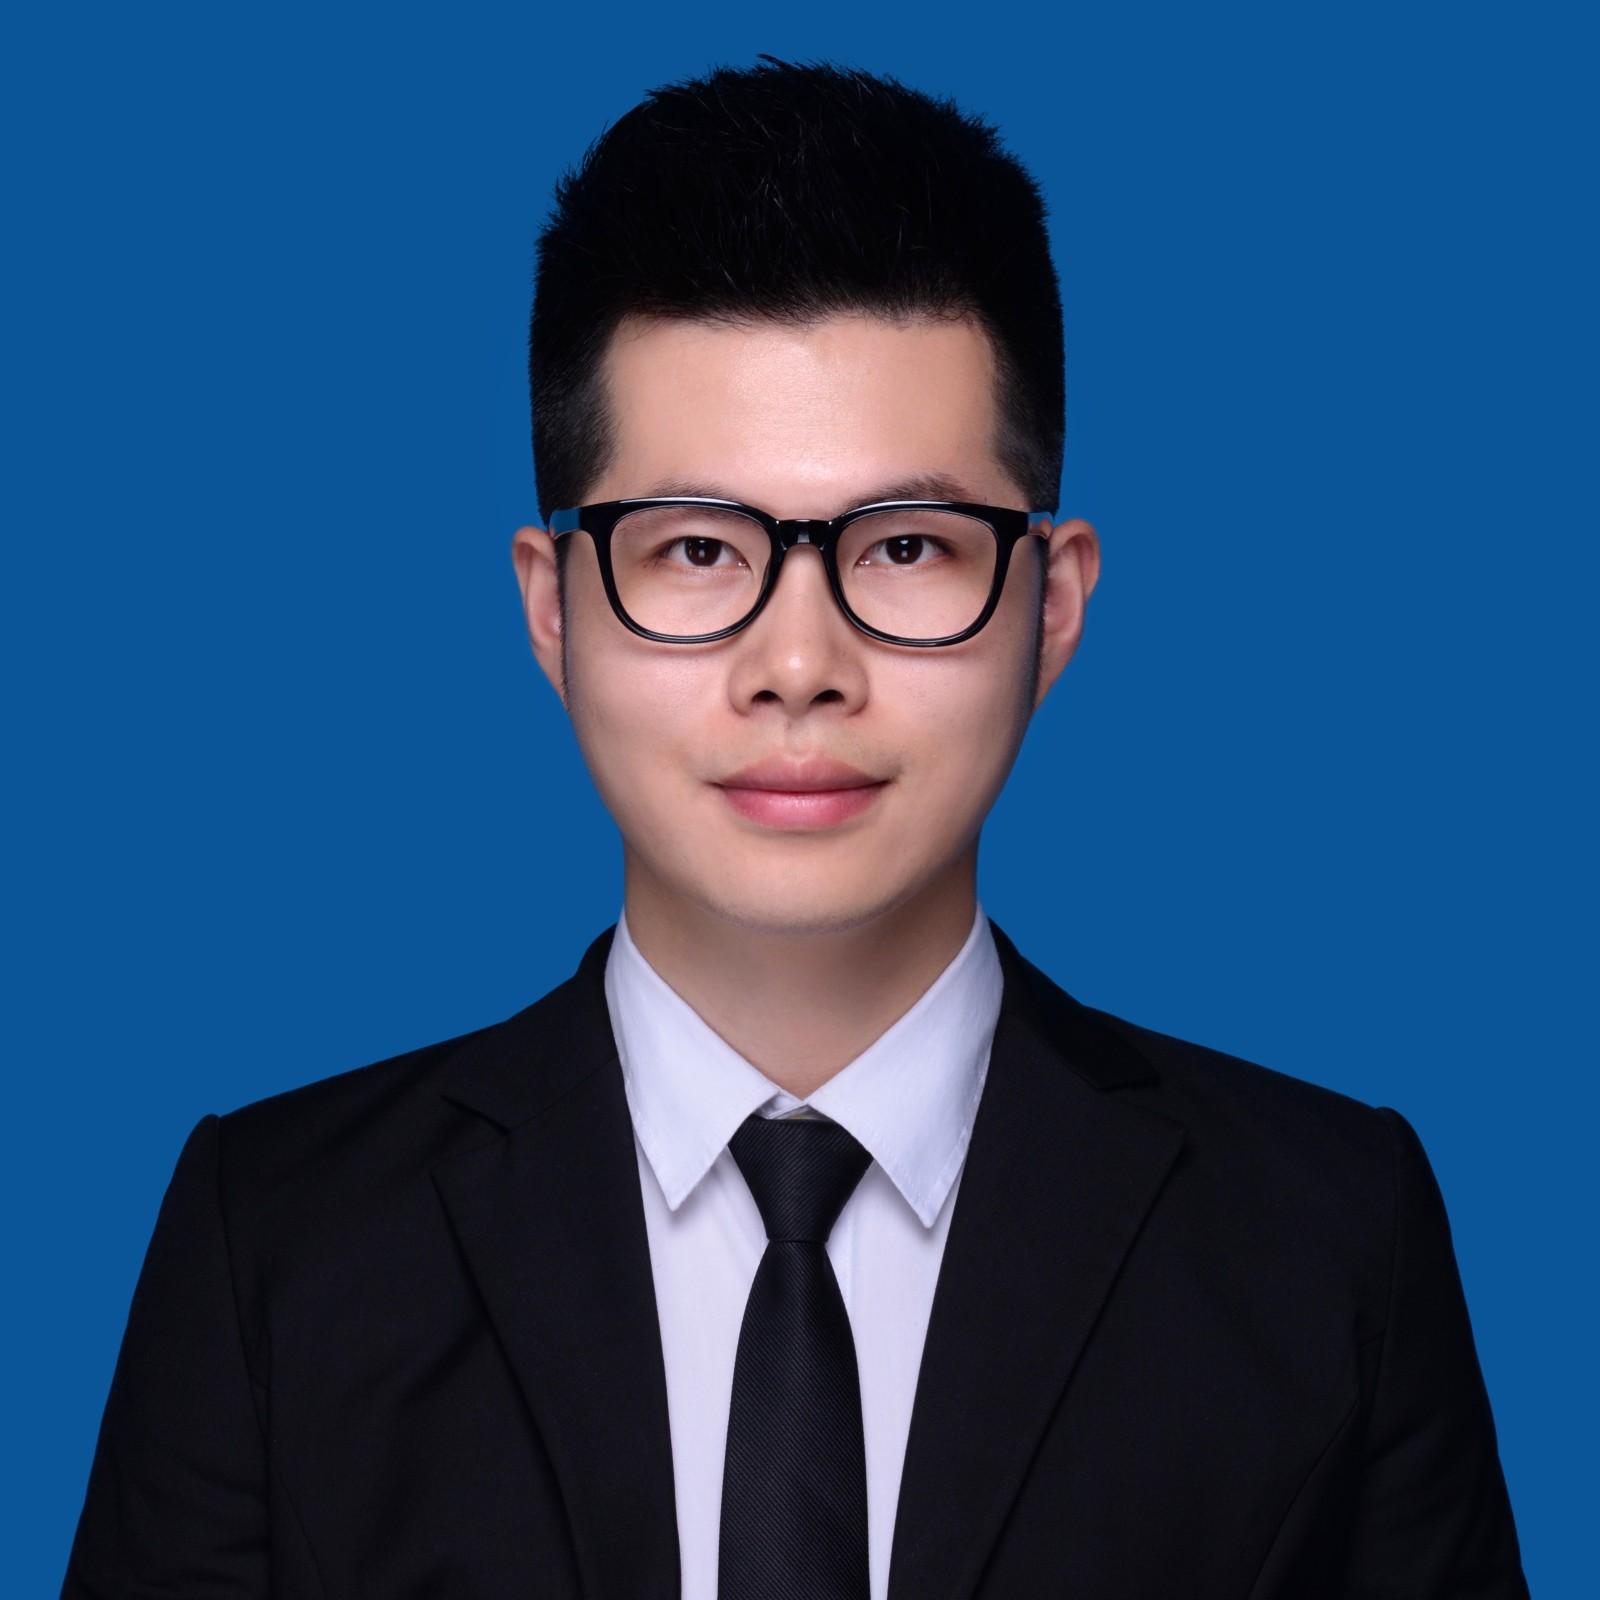 温州律师陈中君